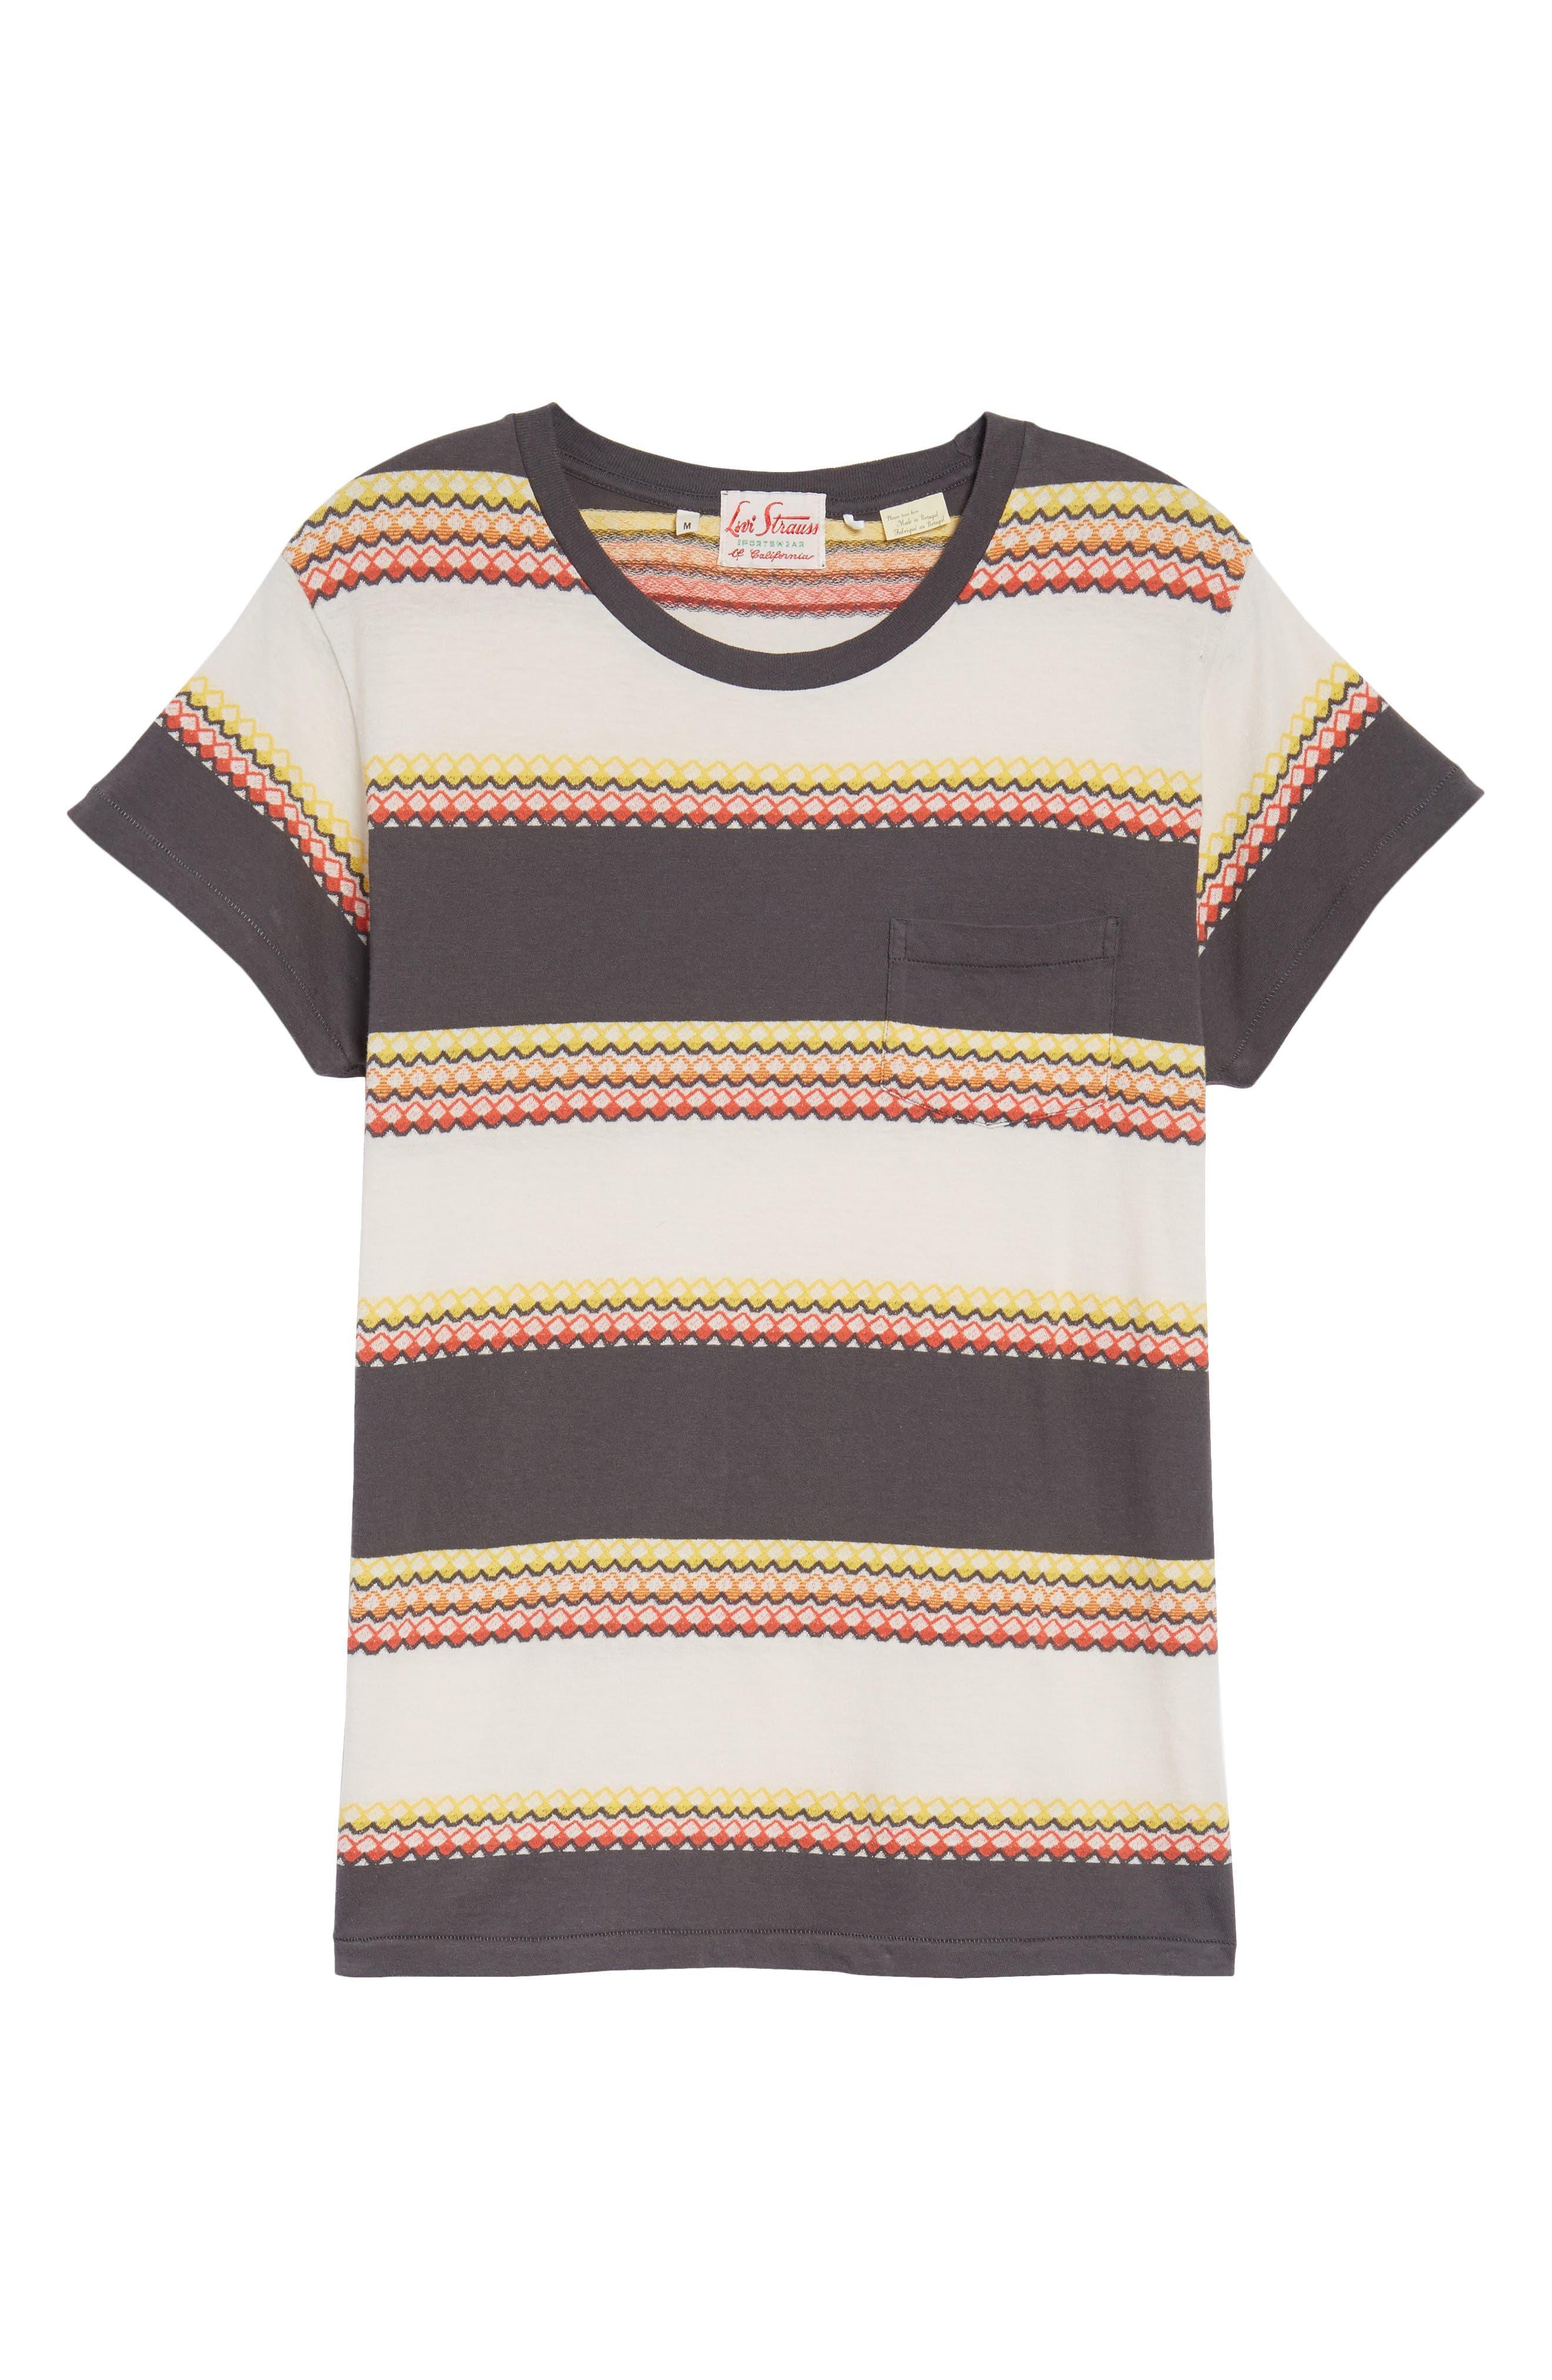 1950s Sportswear Pocket T-Shirt,                             Alternate thumbnail 6, color,                             499